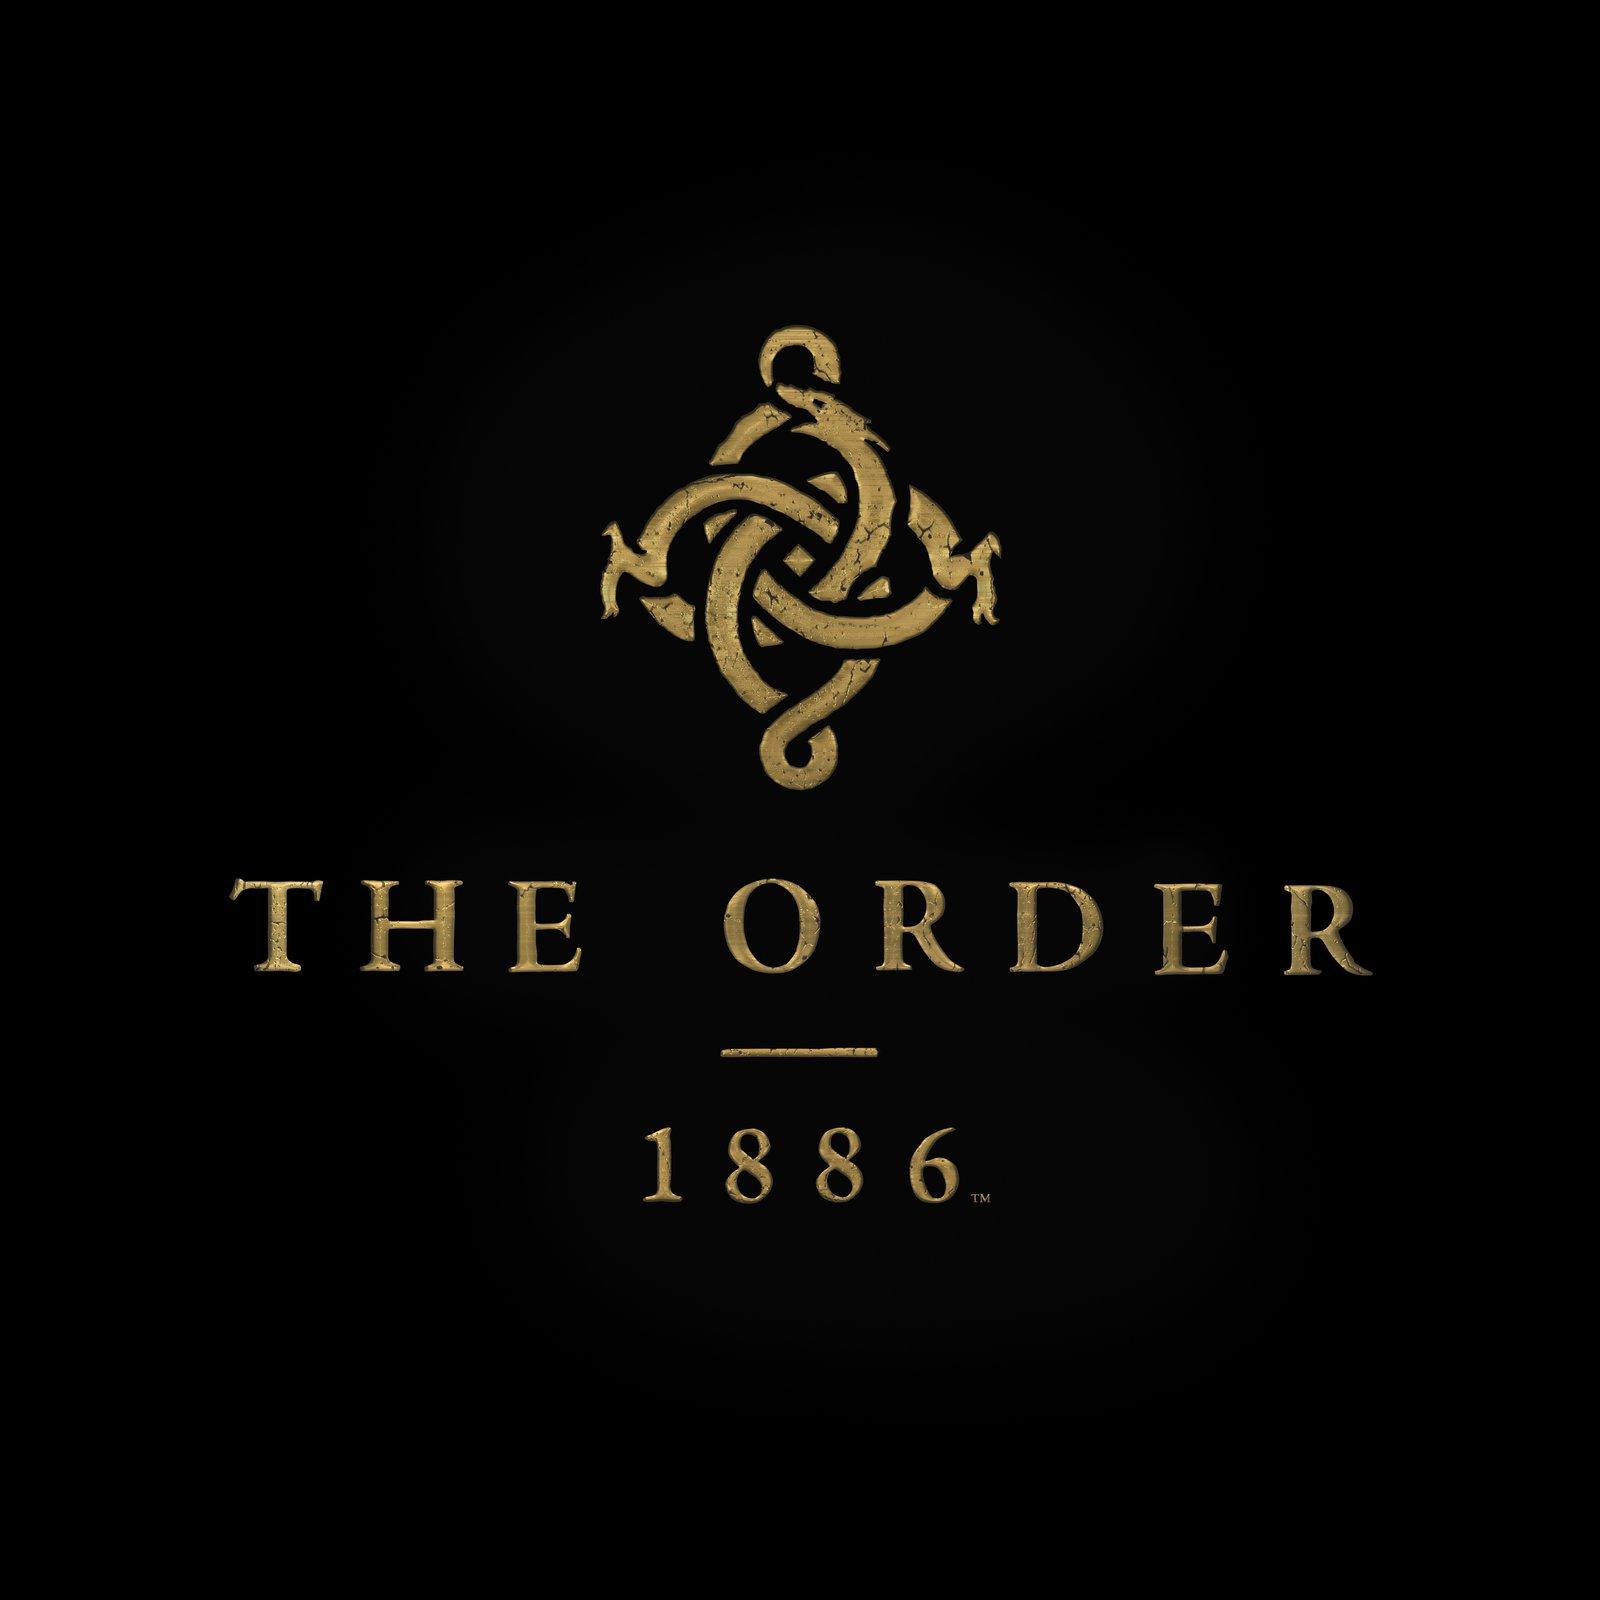 The Order 1886 WallPaper Logotype 5000x5000 by eskMaemo on deviantART 1600x1600